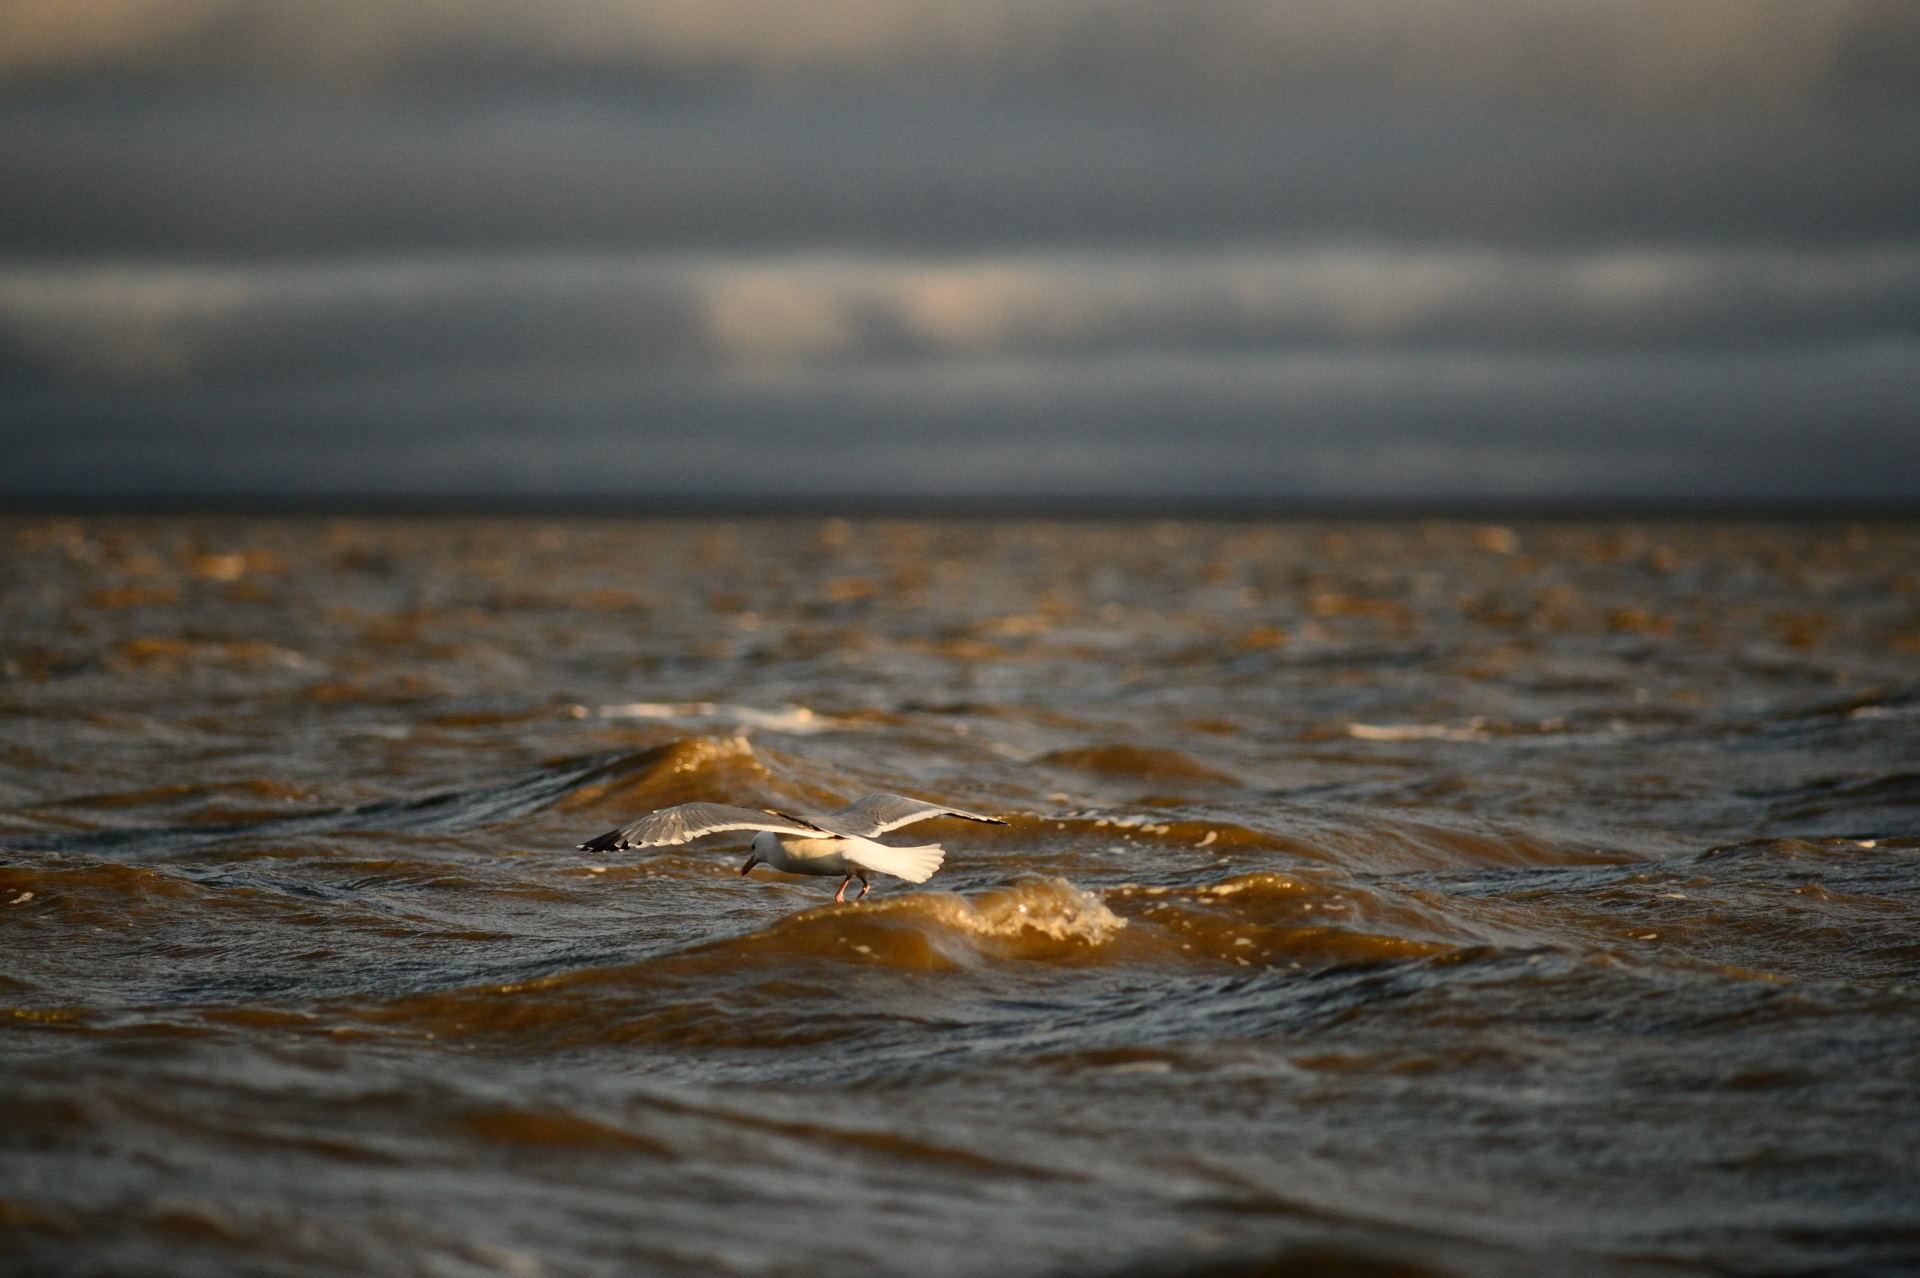 Восточно-Сибирское море встретило